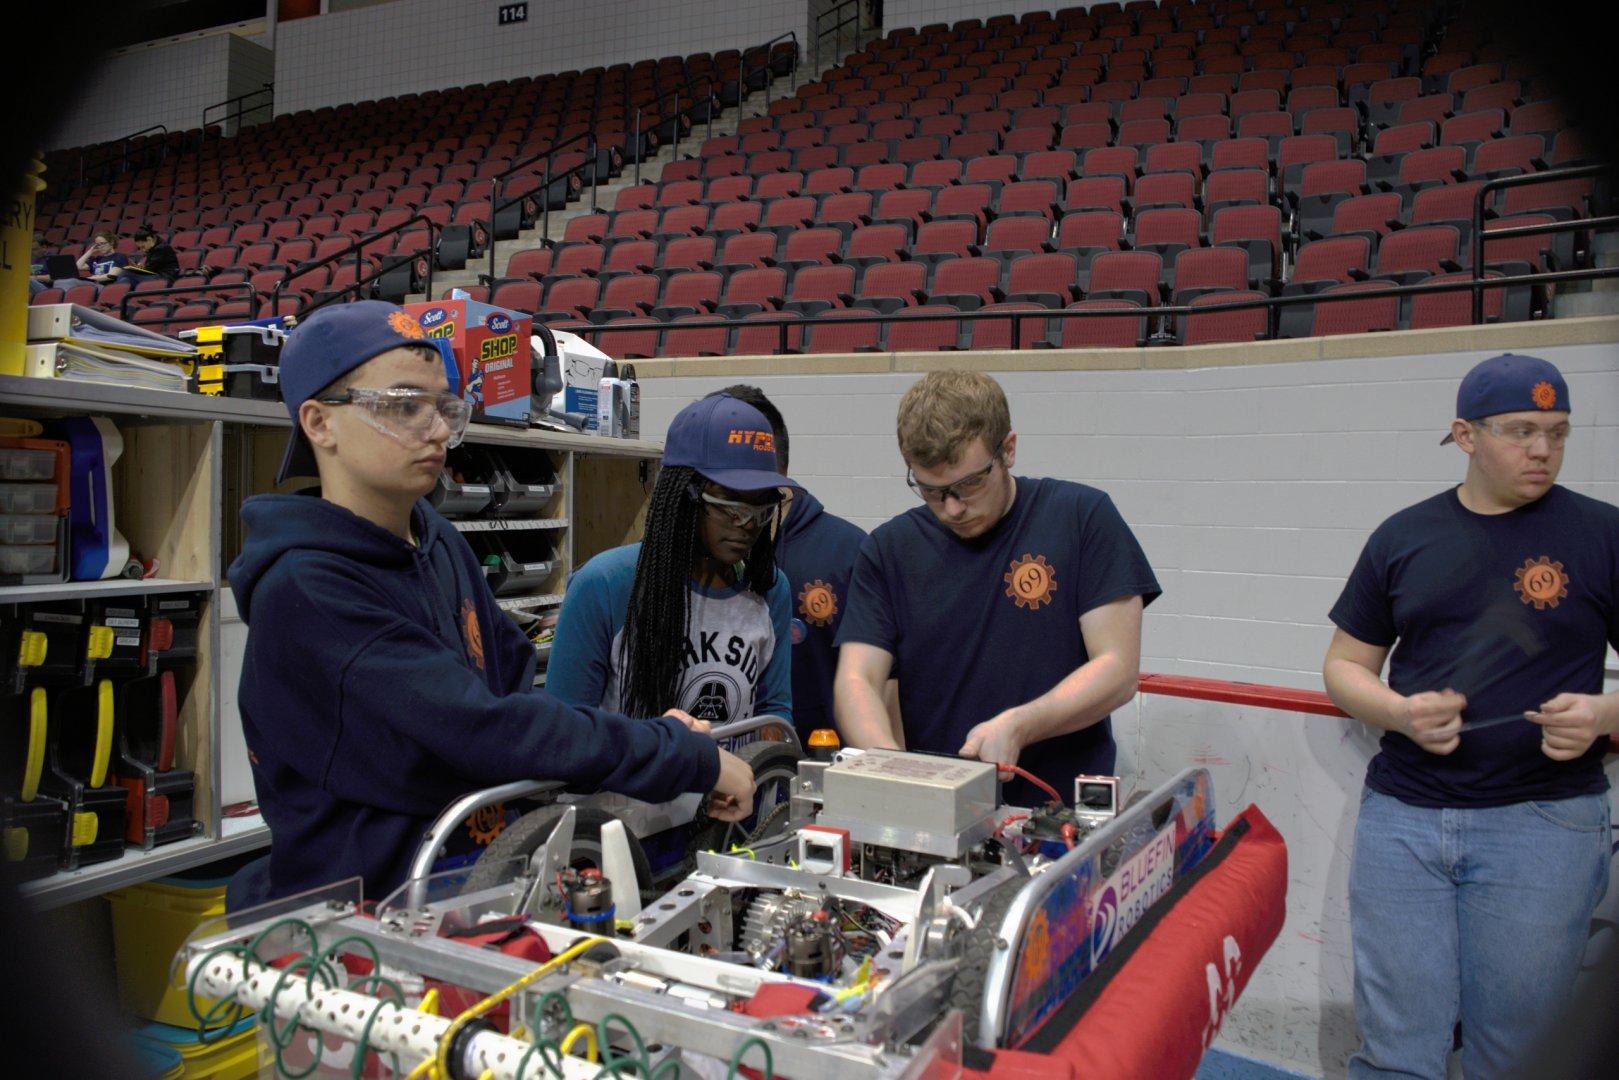 038.Boston FIRST Robotics Competition 04-03-2016.jpg